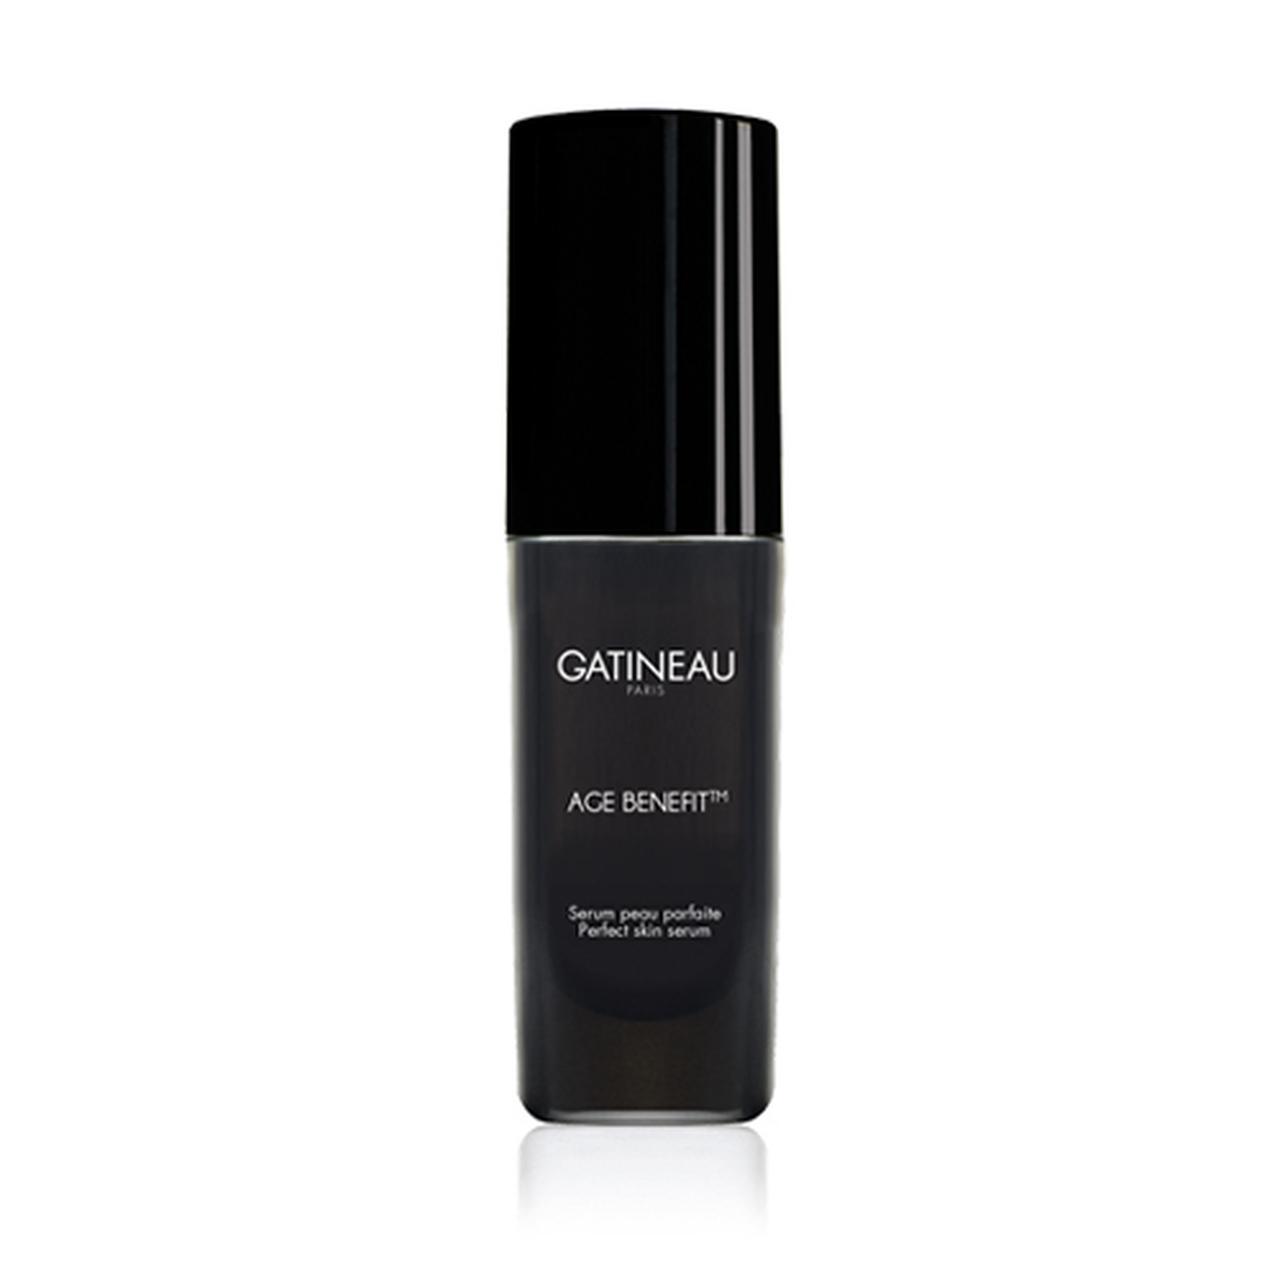 Age Benefit™ Perfect Skin Serum 30ml